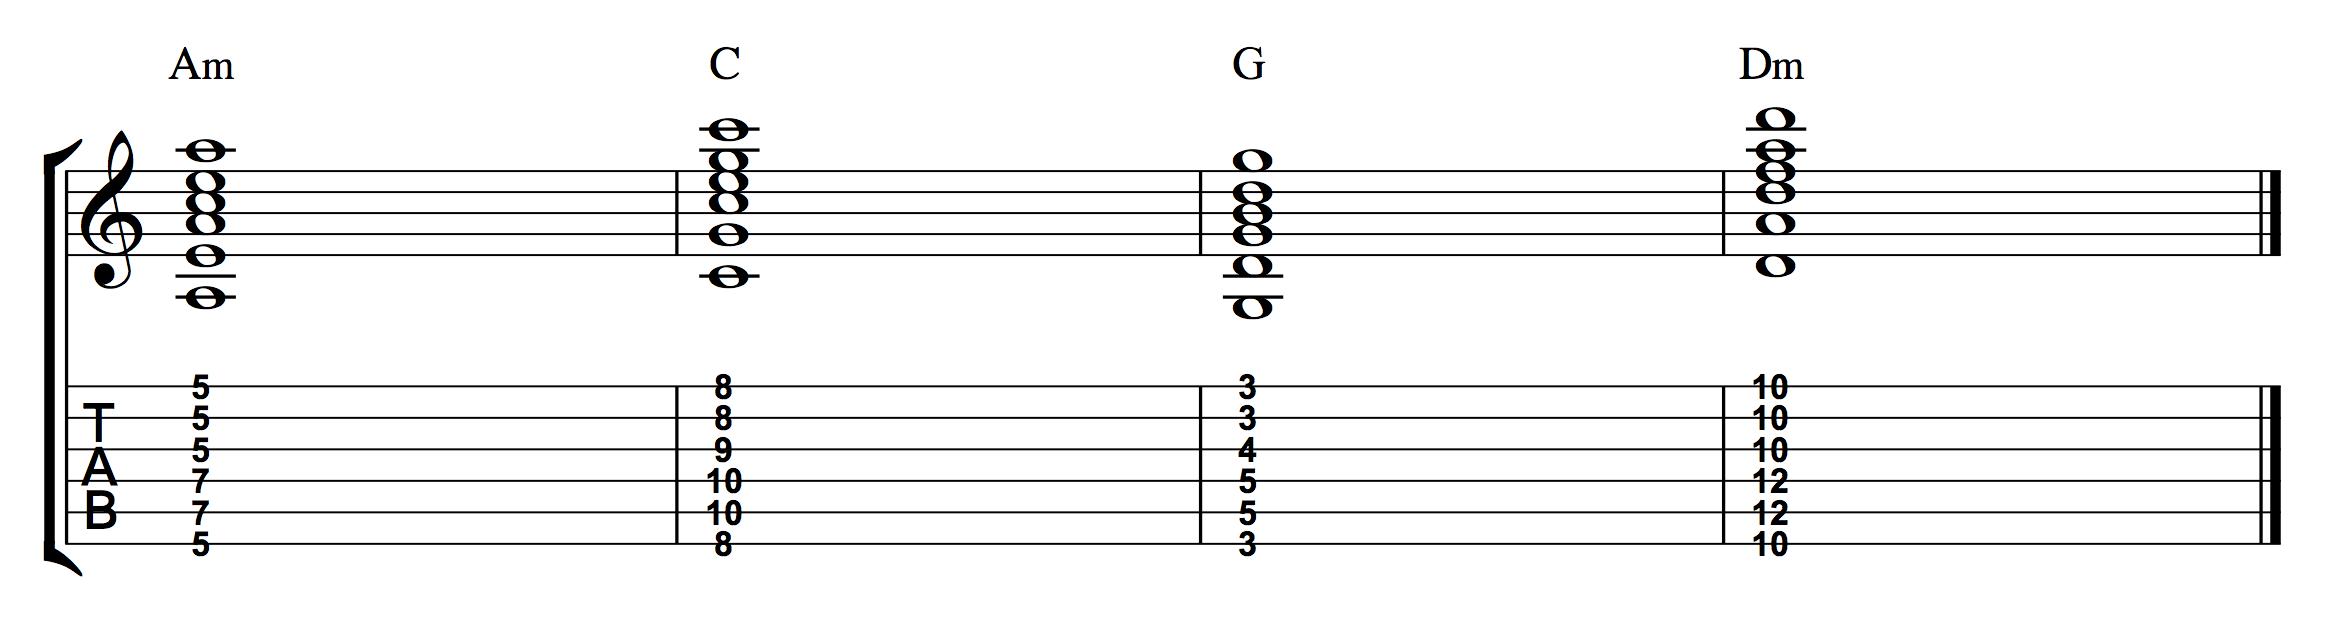 Chord Ex 2 - Demo 1